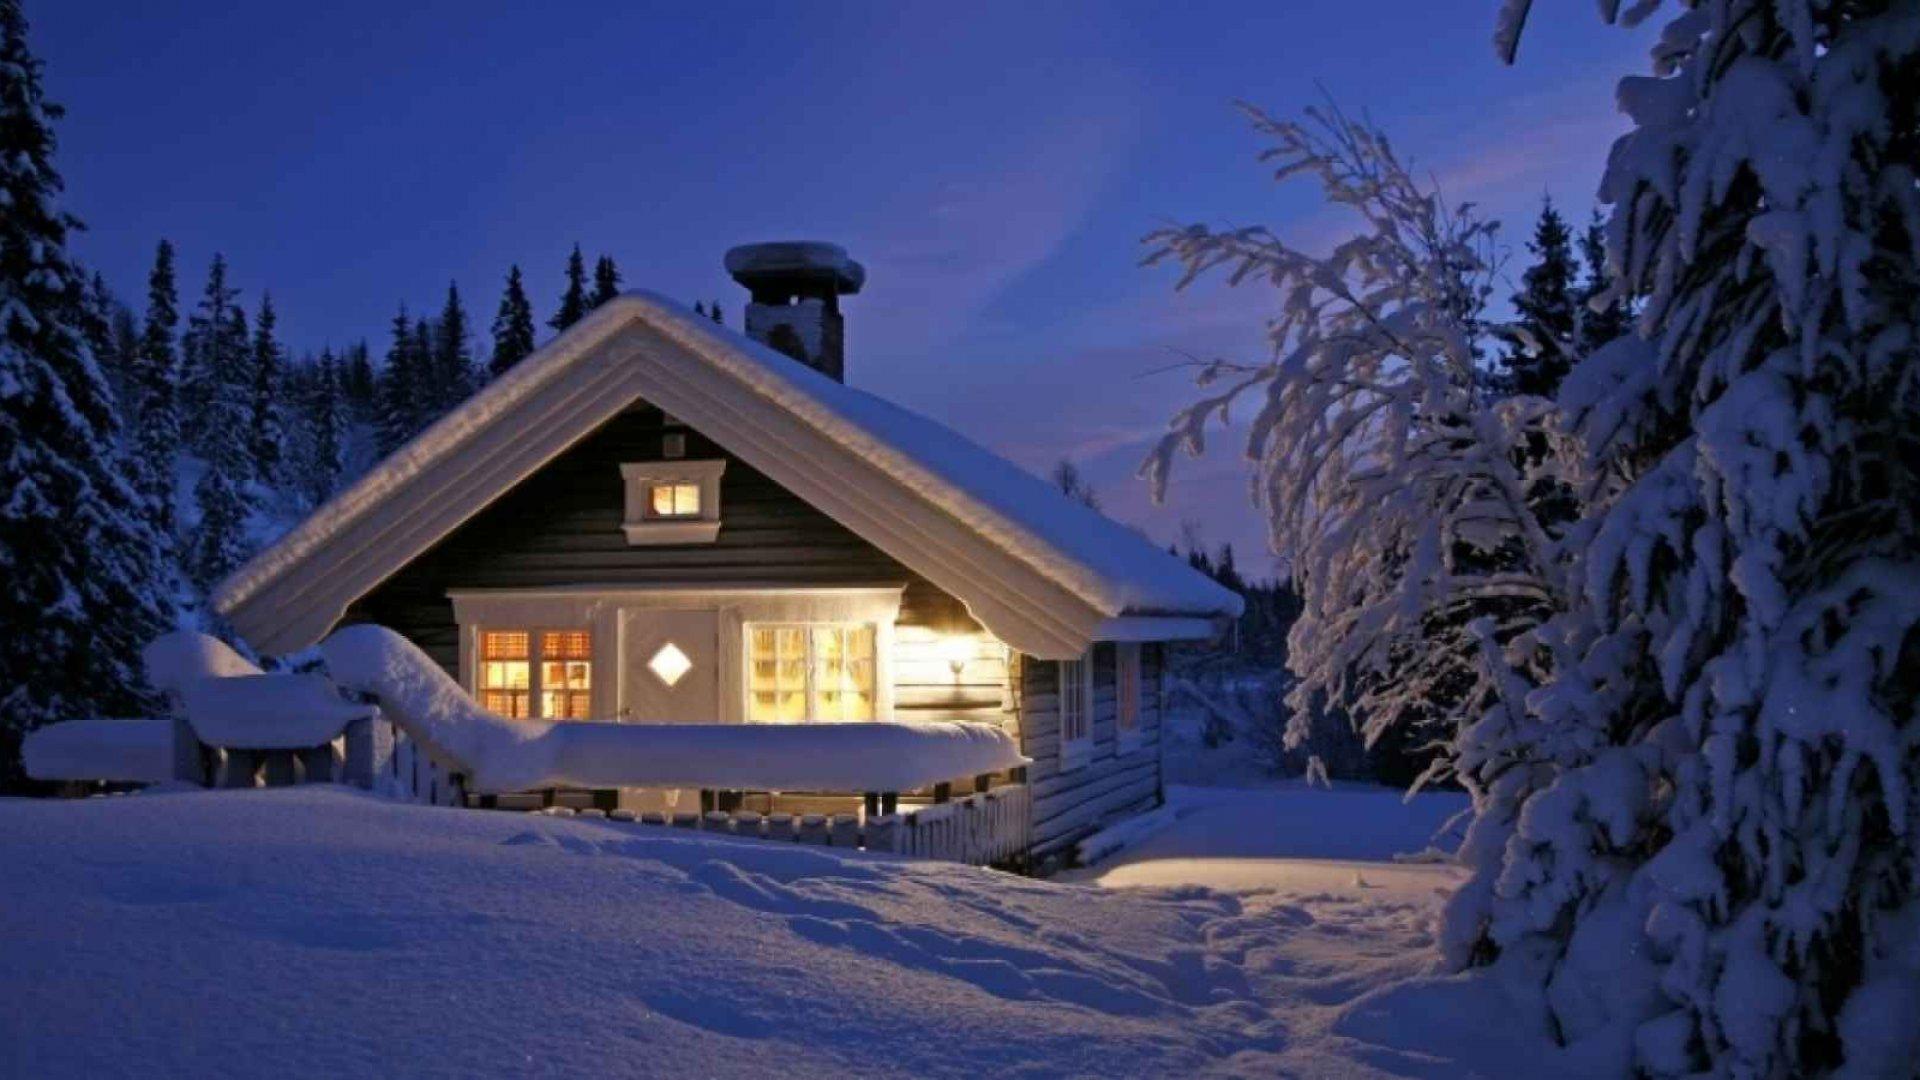 Why Norwegians Don't Get Seasonal Depression